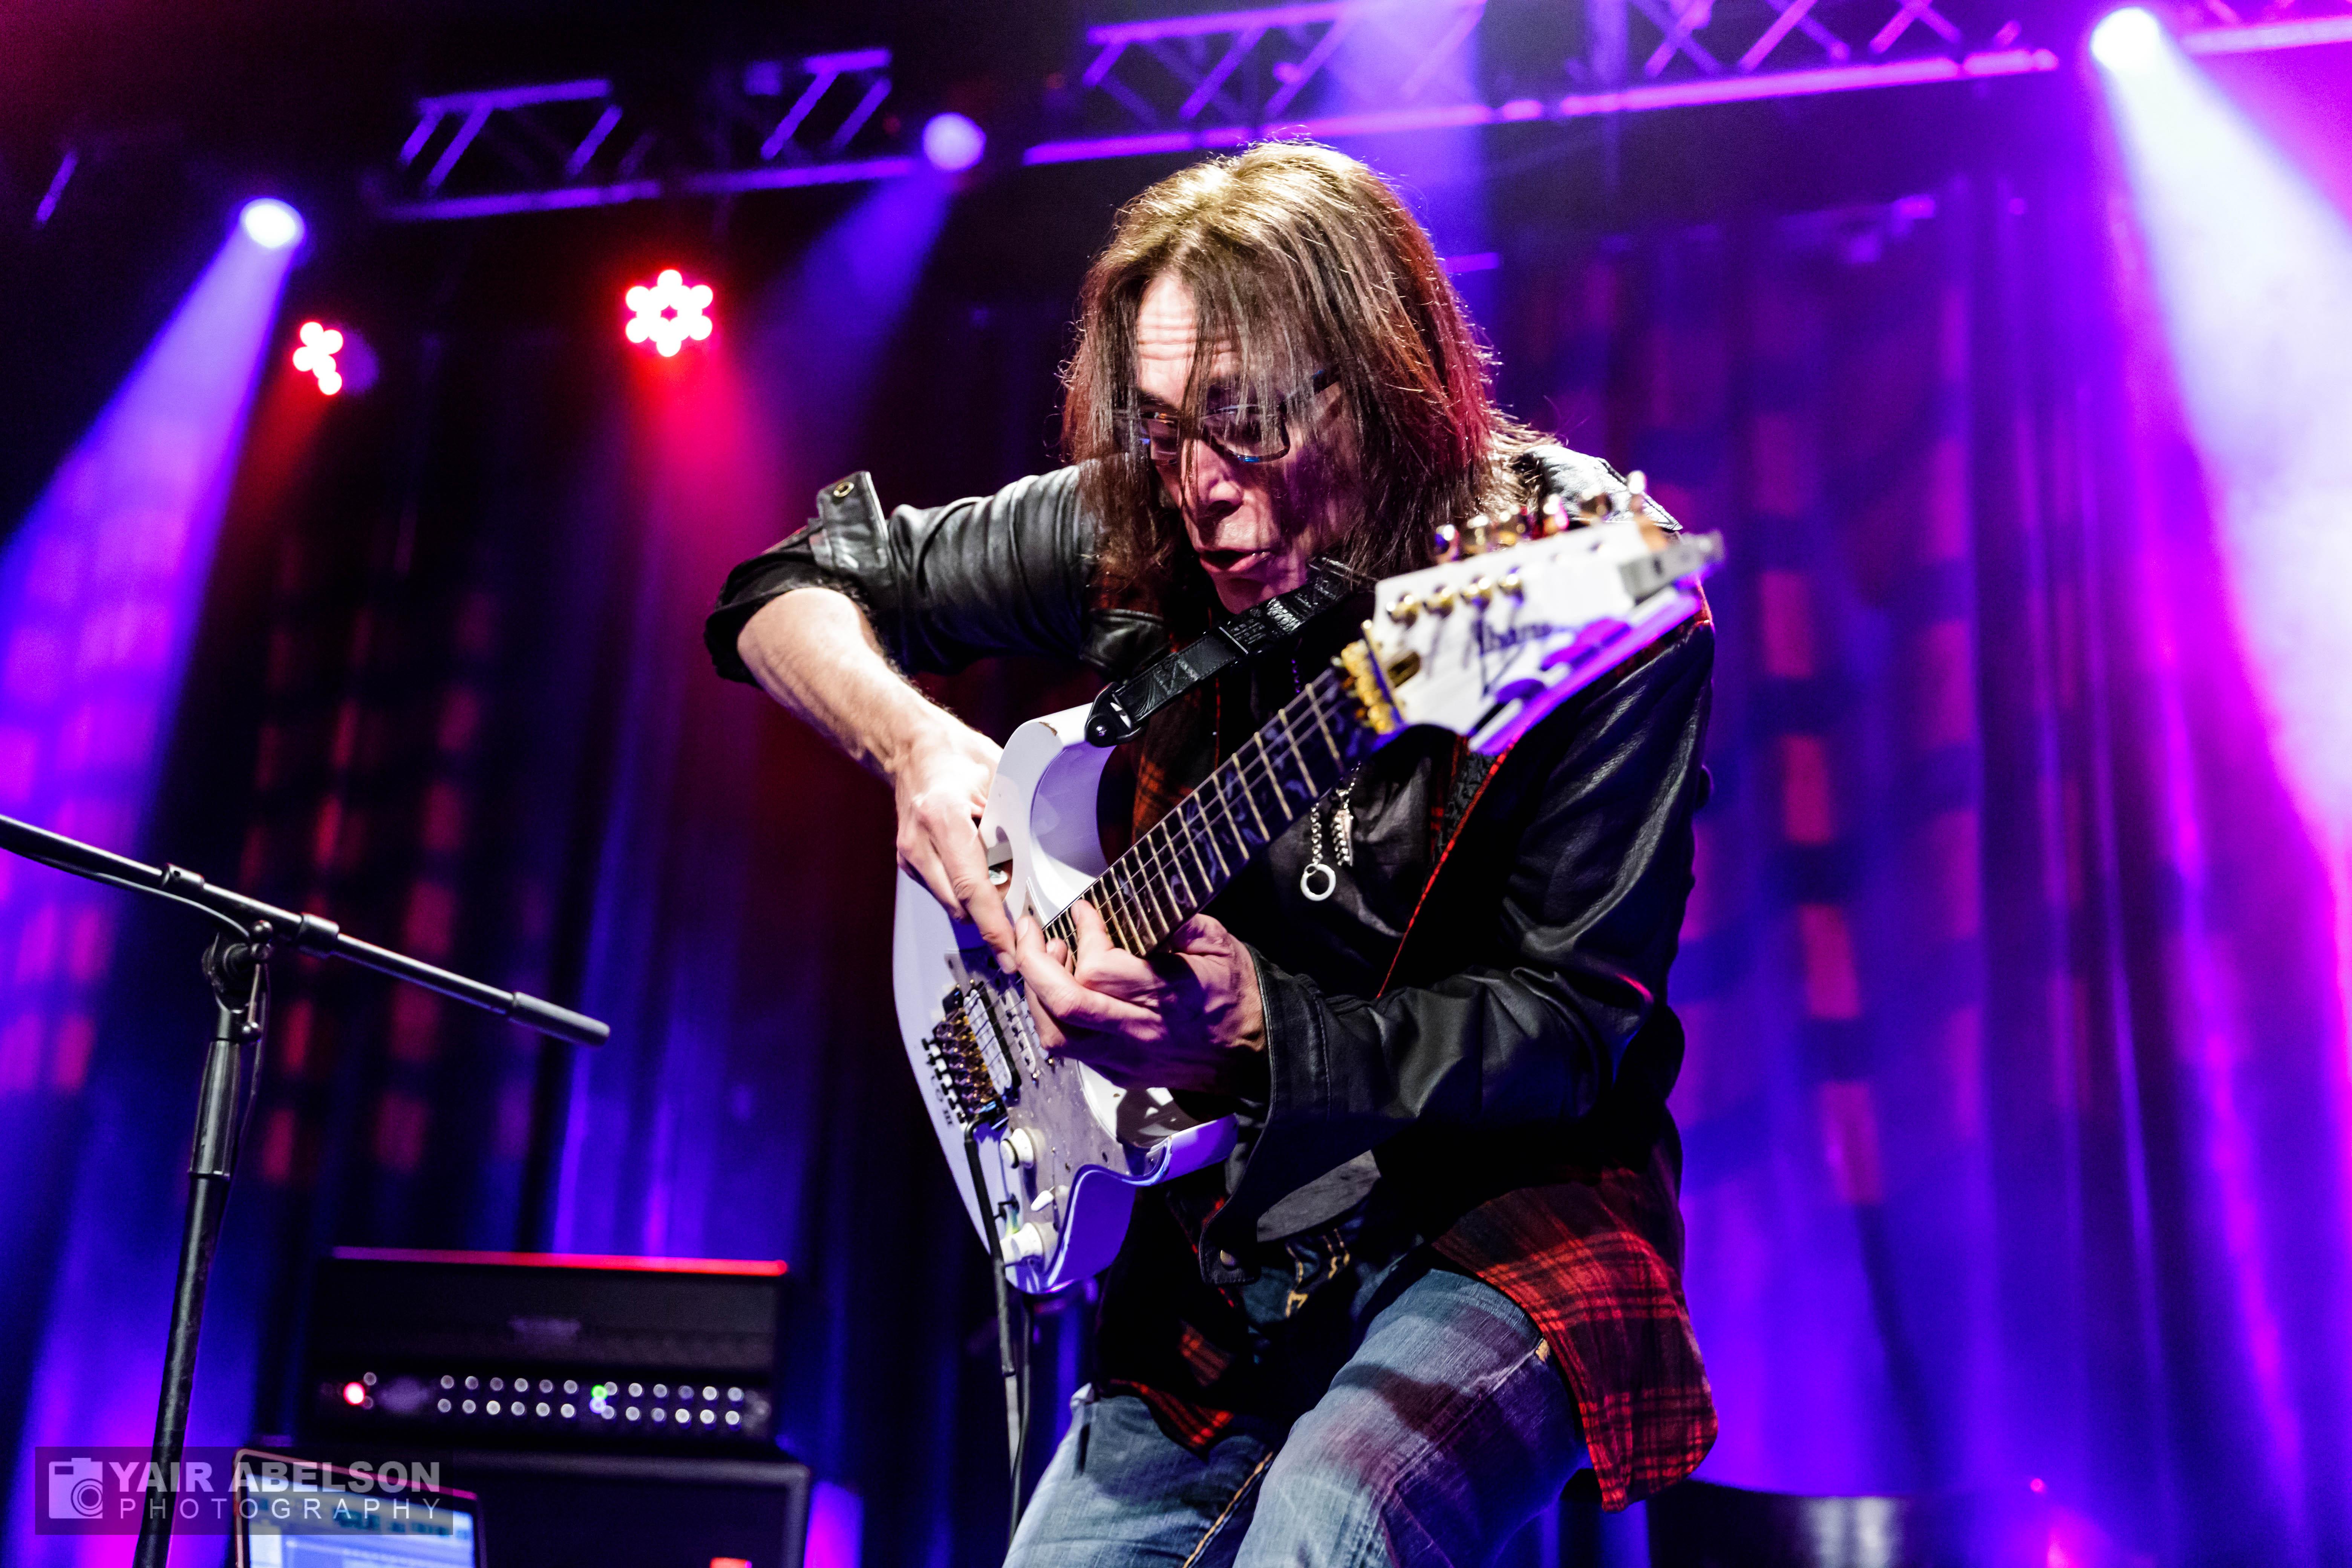 Steve Vei, Guitar